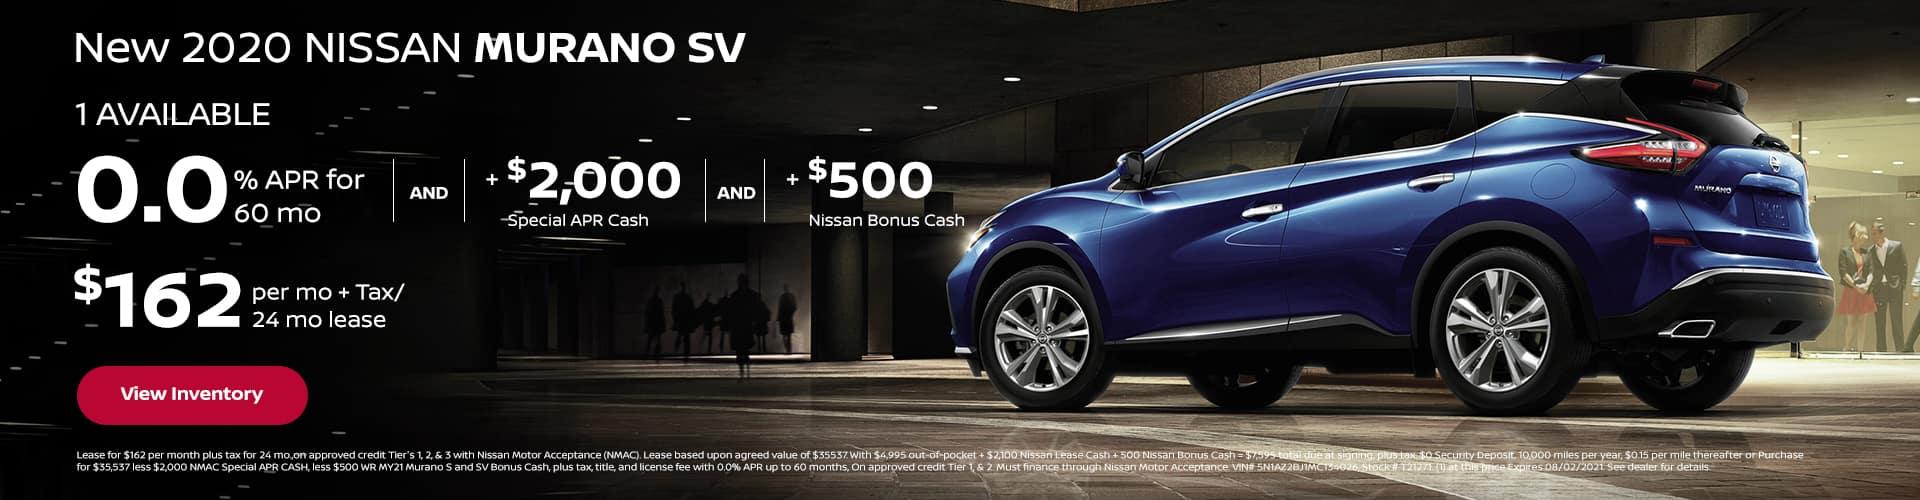 "0% APR x 60 mo + $2,000 Special APR Cash + $500 Nissan Bonus Cash New 2021 NISSAN MURANO ""SV"" (1) AVAILABLE $162 per mo. + Tax / 24 mo lease"